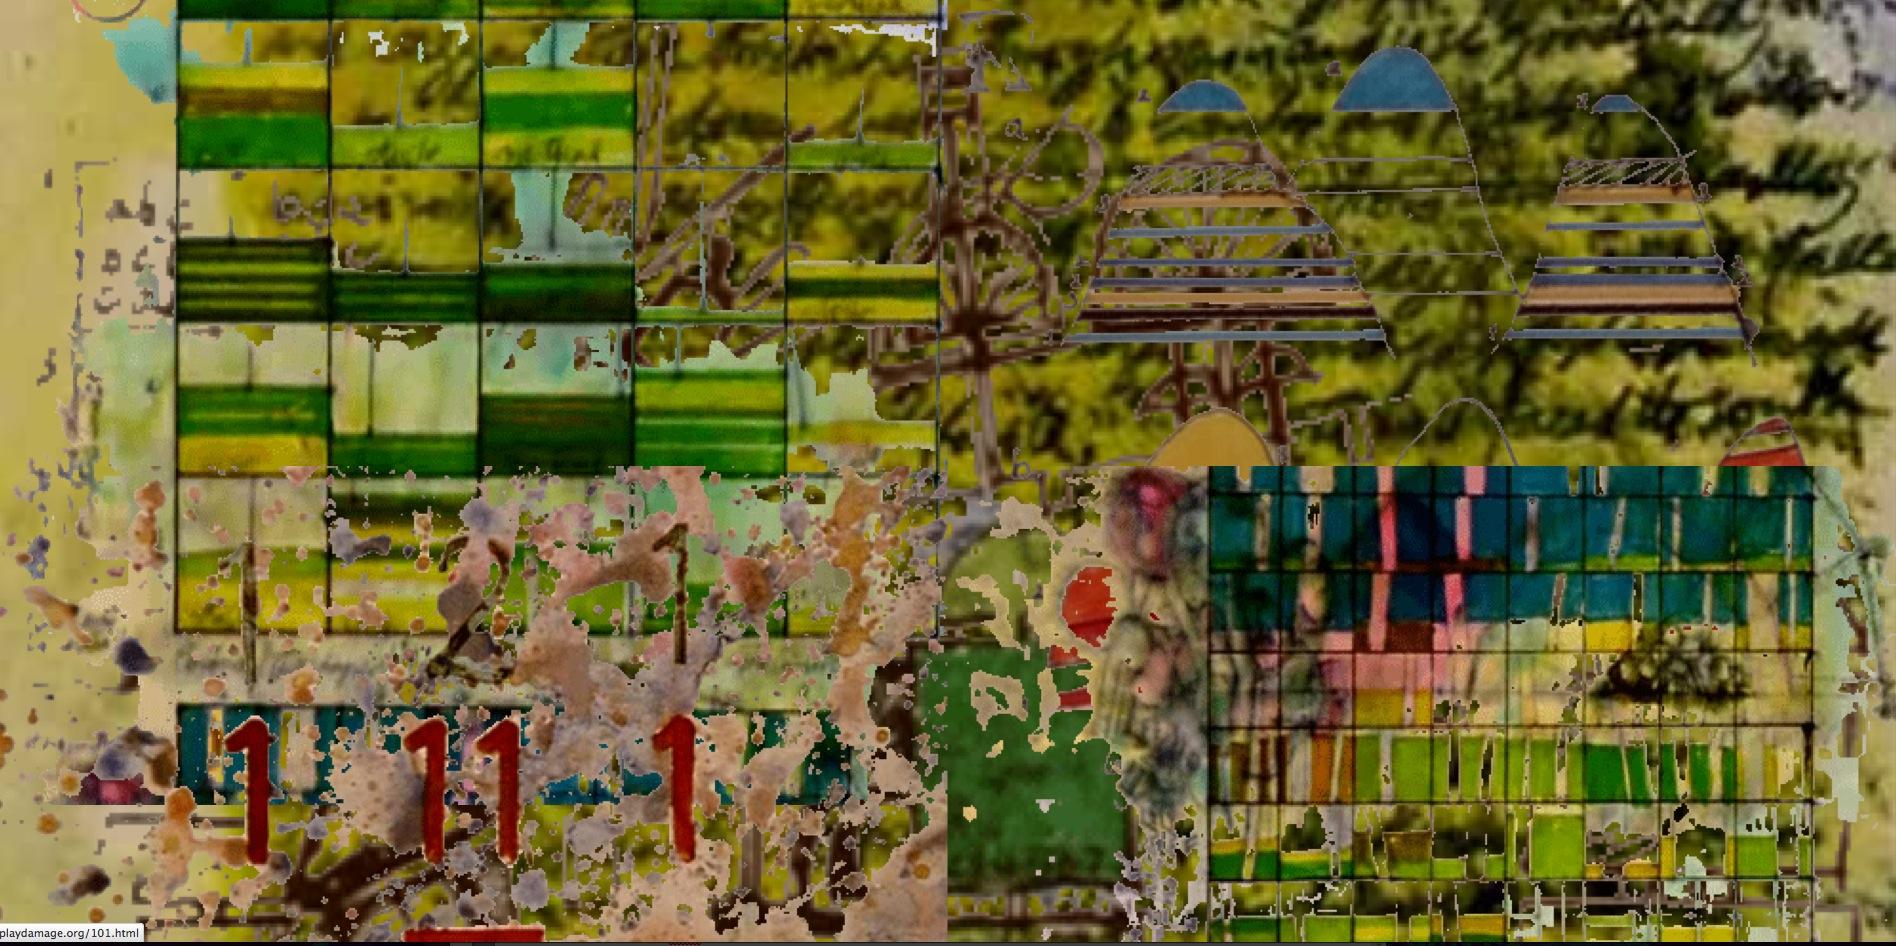 Screenshot 2014-09-26 06.59.20